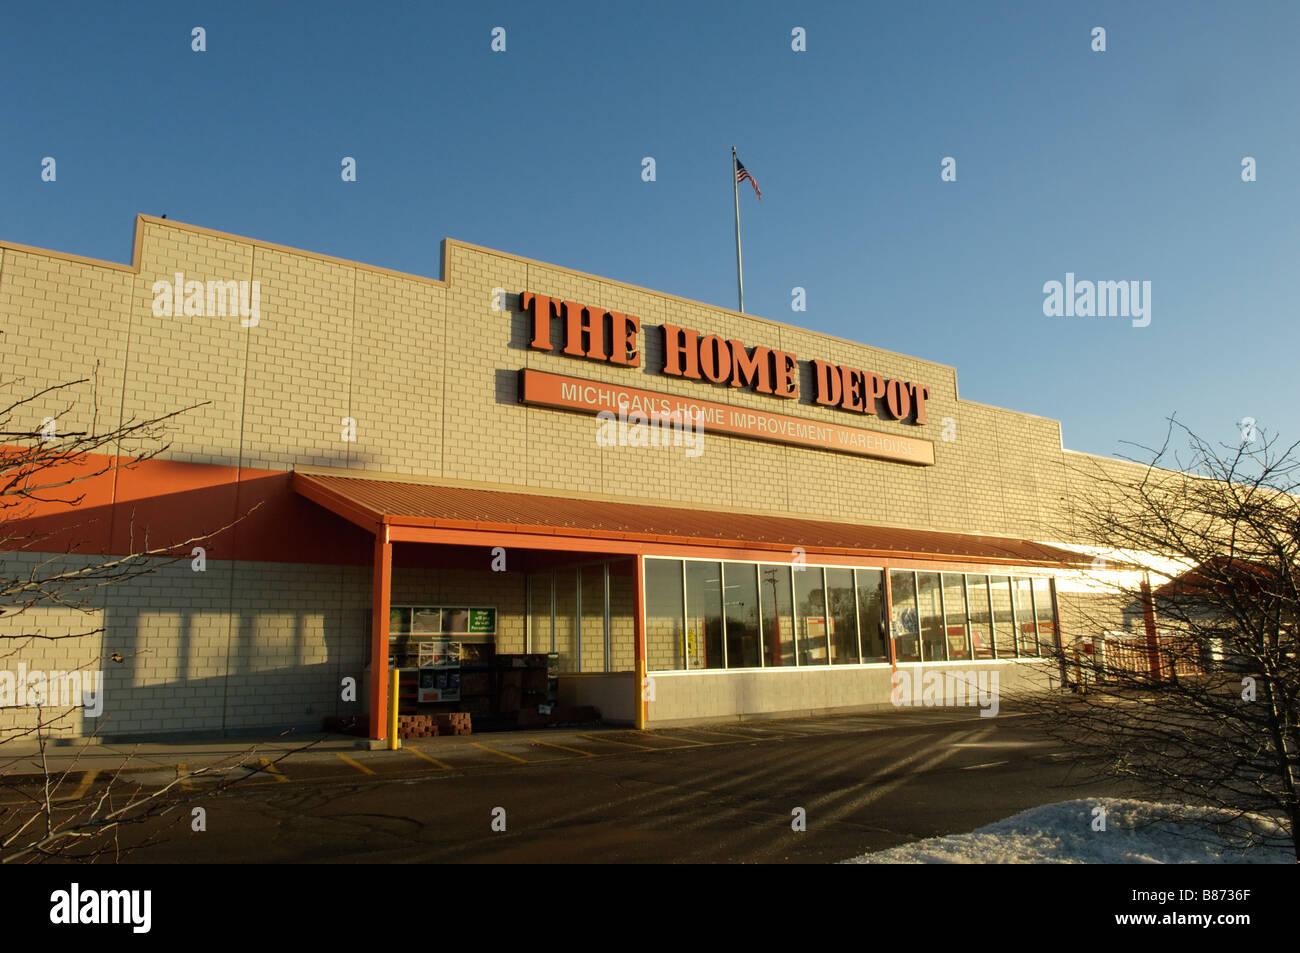 Home Depot Store In Flint Michigan Usa Stock Photo 22283815